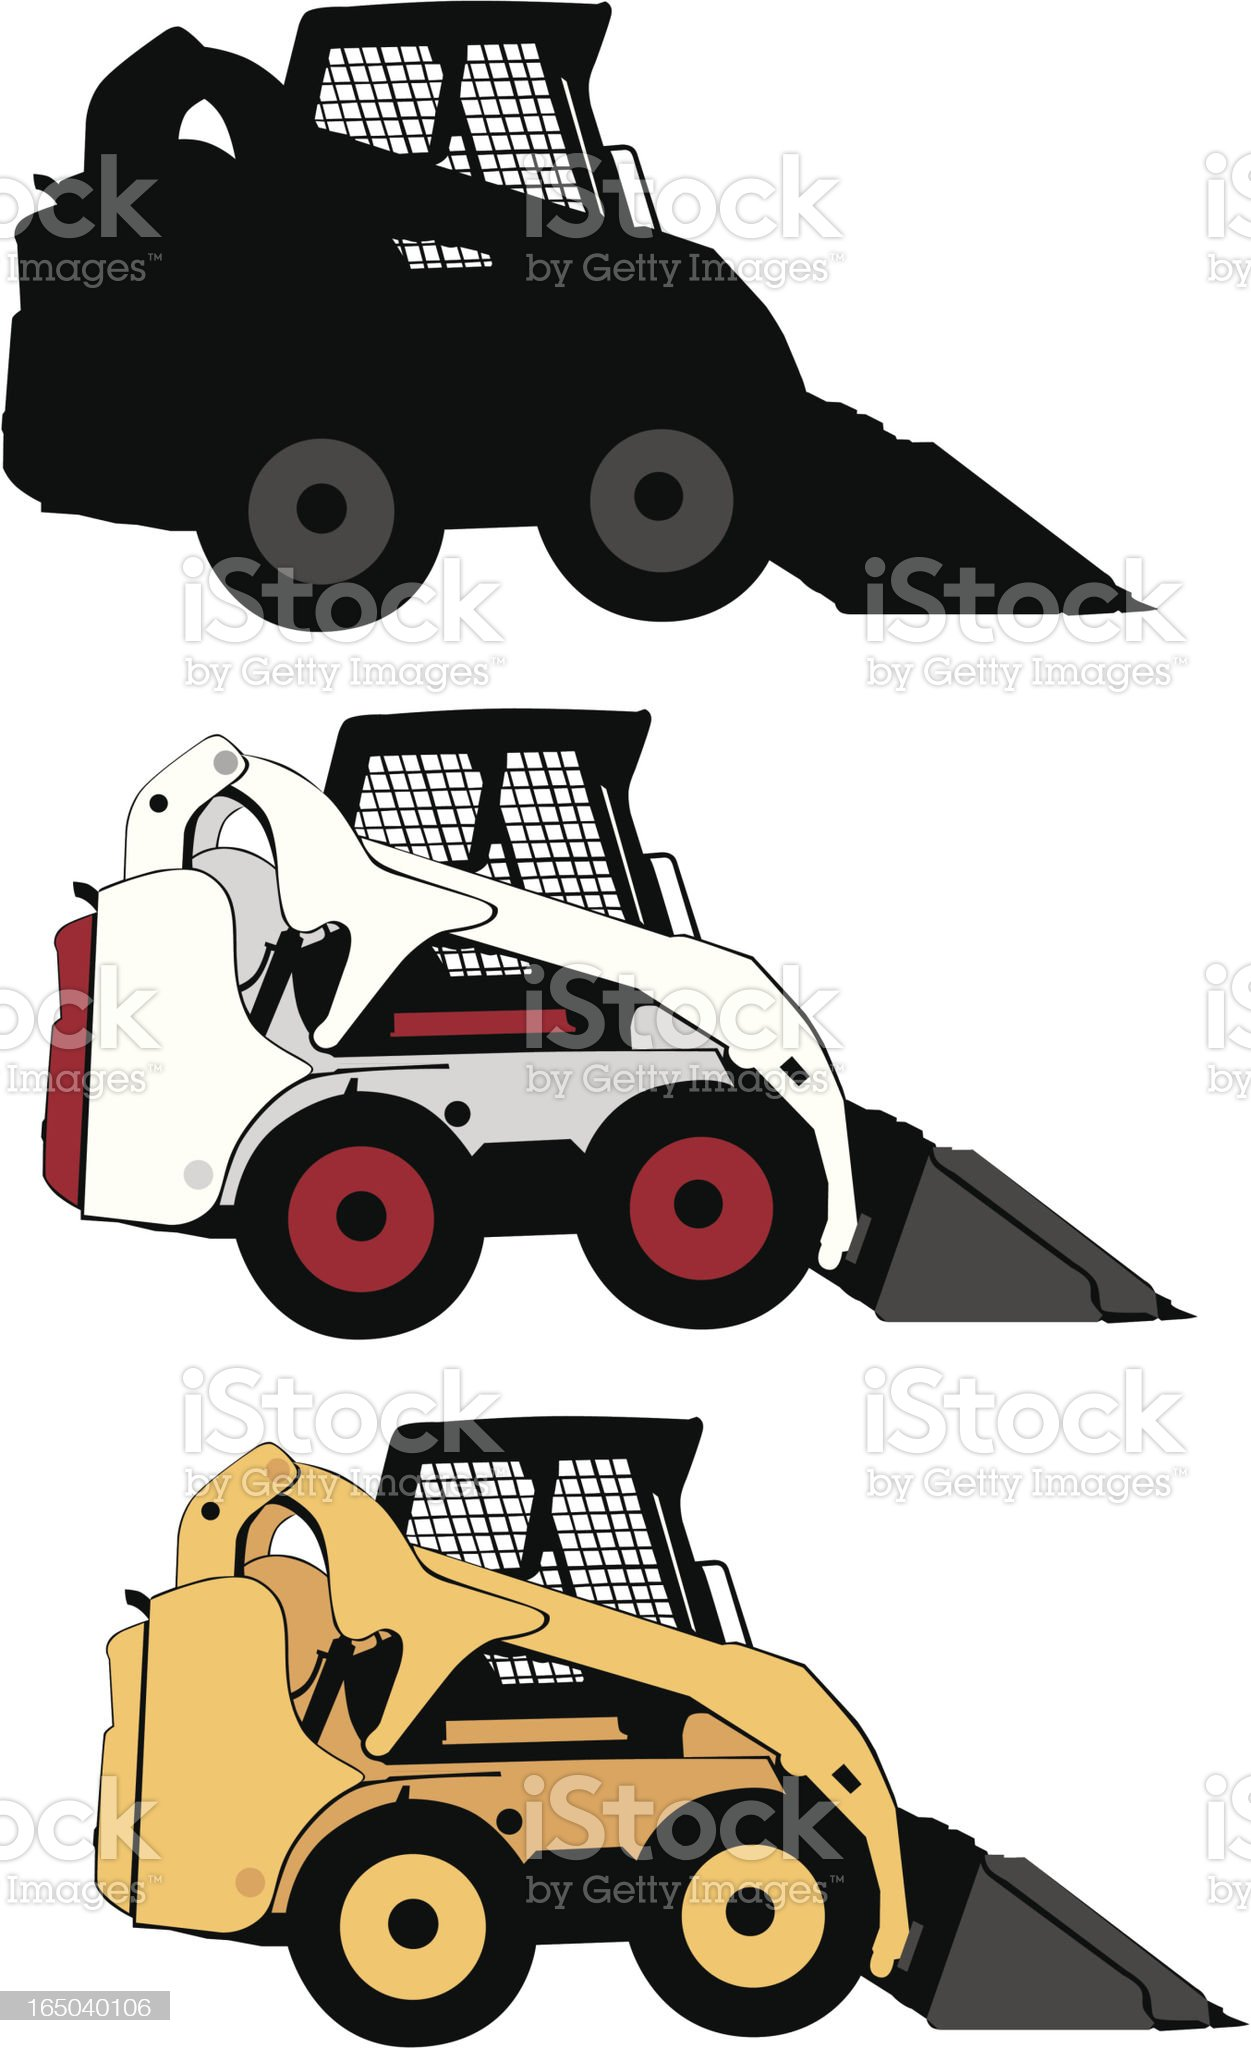 Construction Vehicles: Skid Steer Loader royalty-free stock vector art